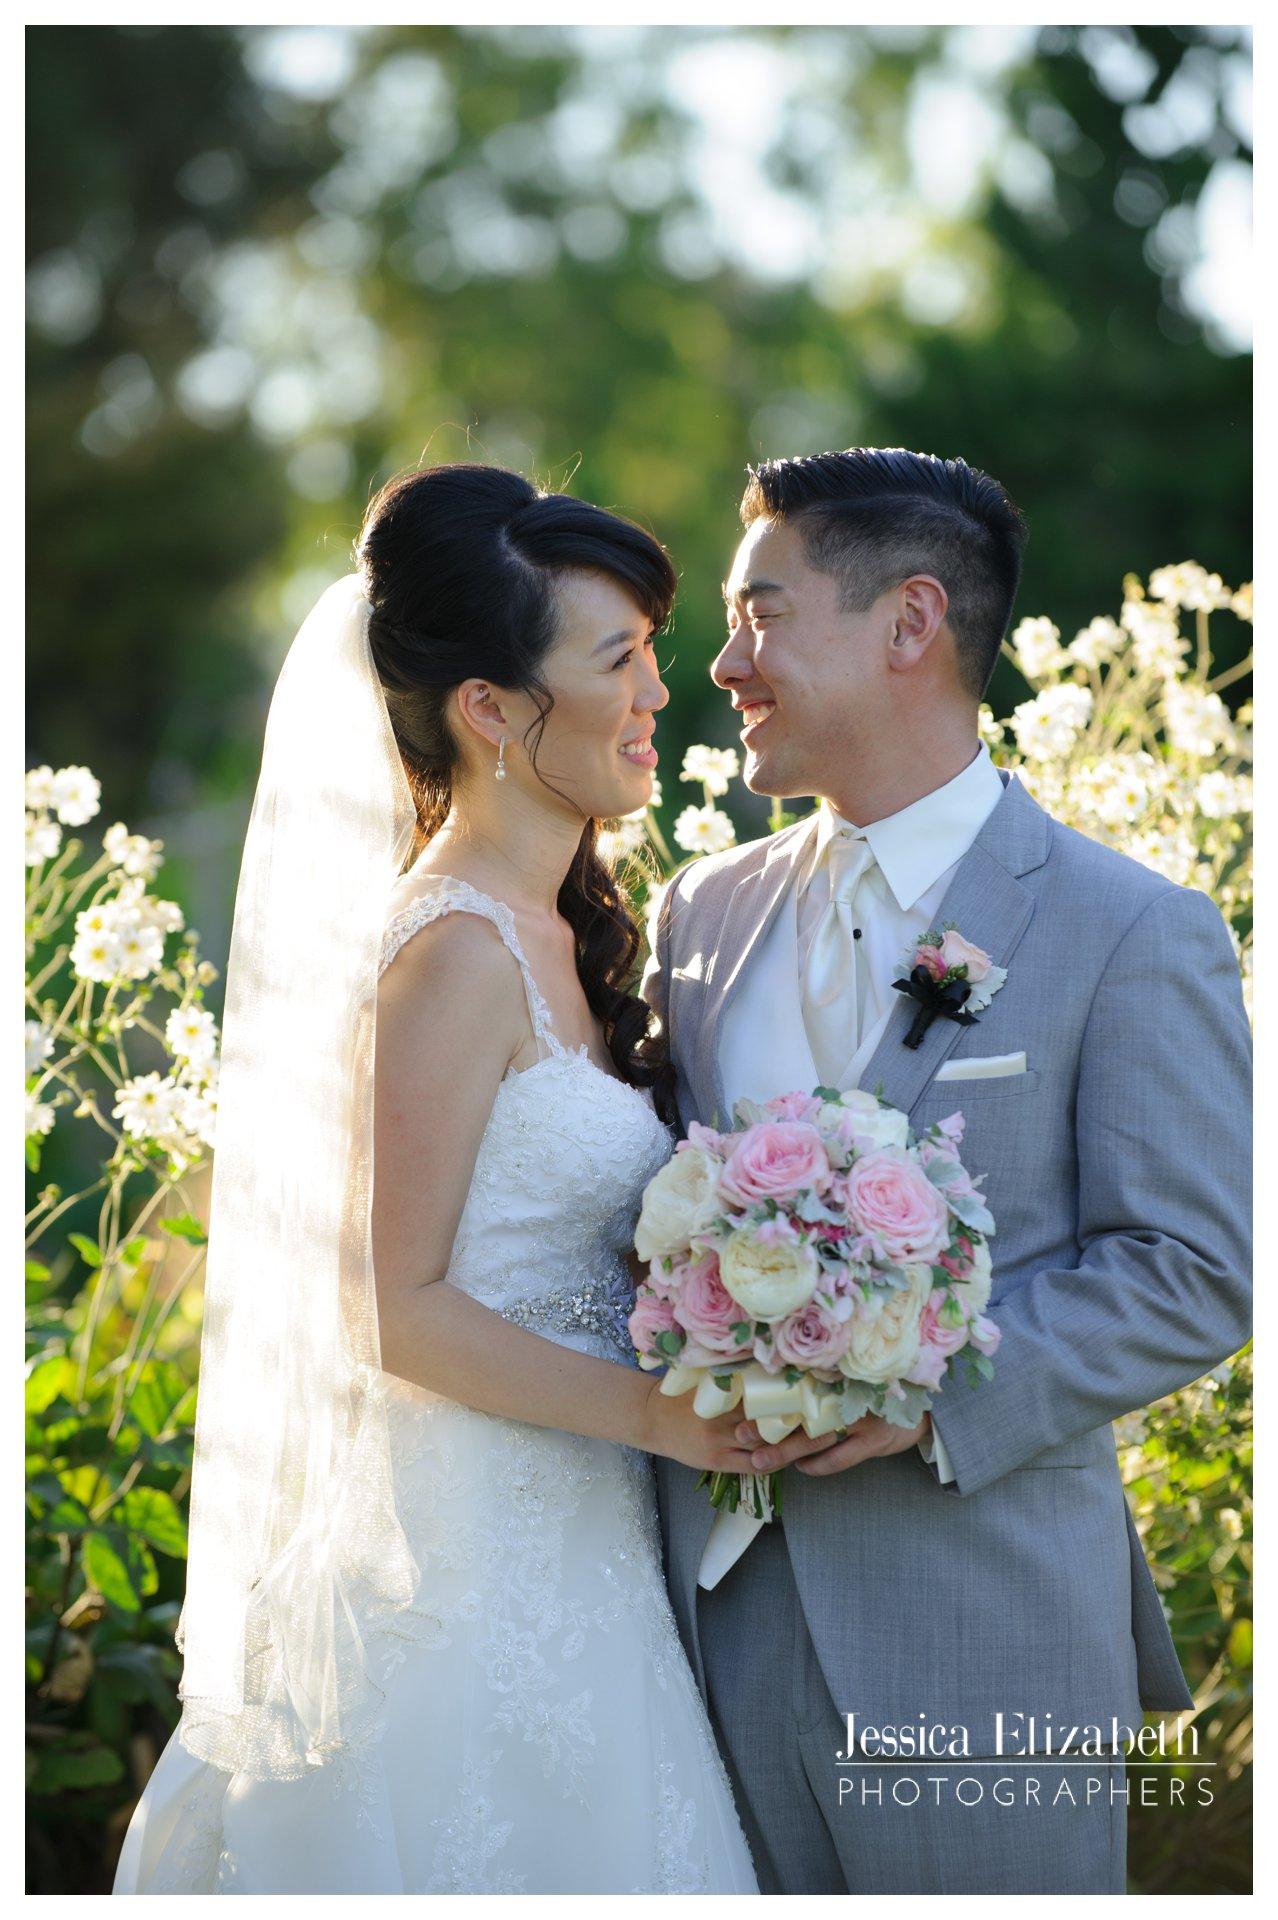 25-South-Coast-Botanic-Garden-Palos-Verdes-Wedding-Photography-by-Jessica-Elizabeth1.jpg